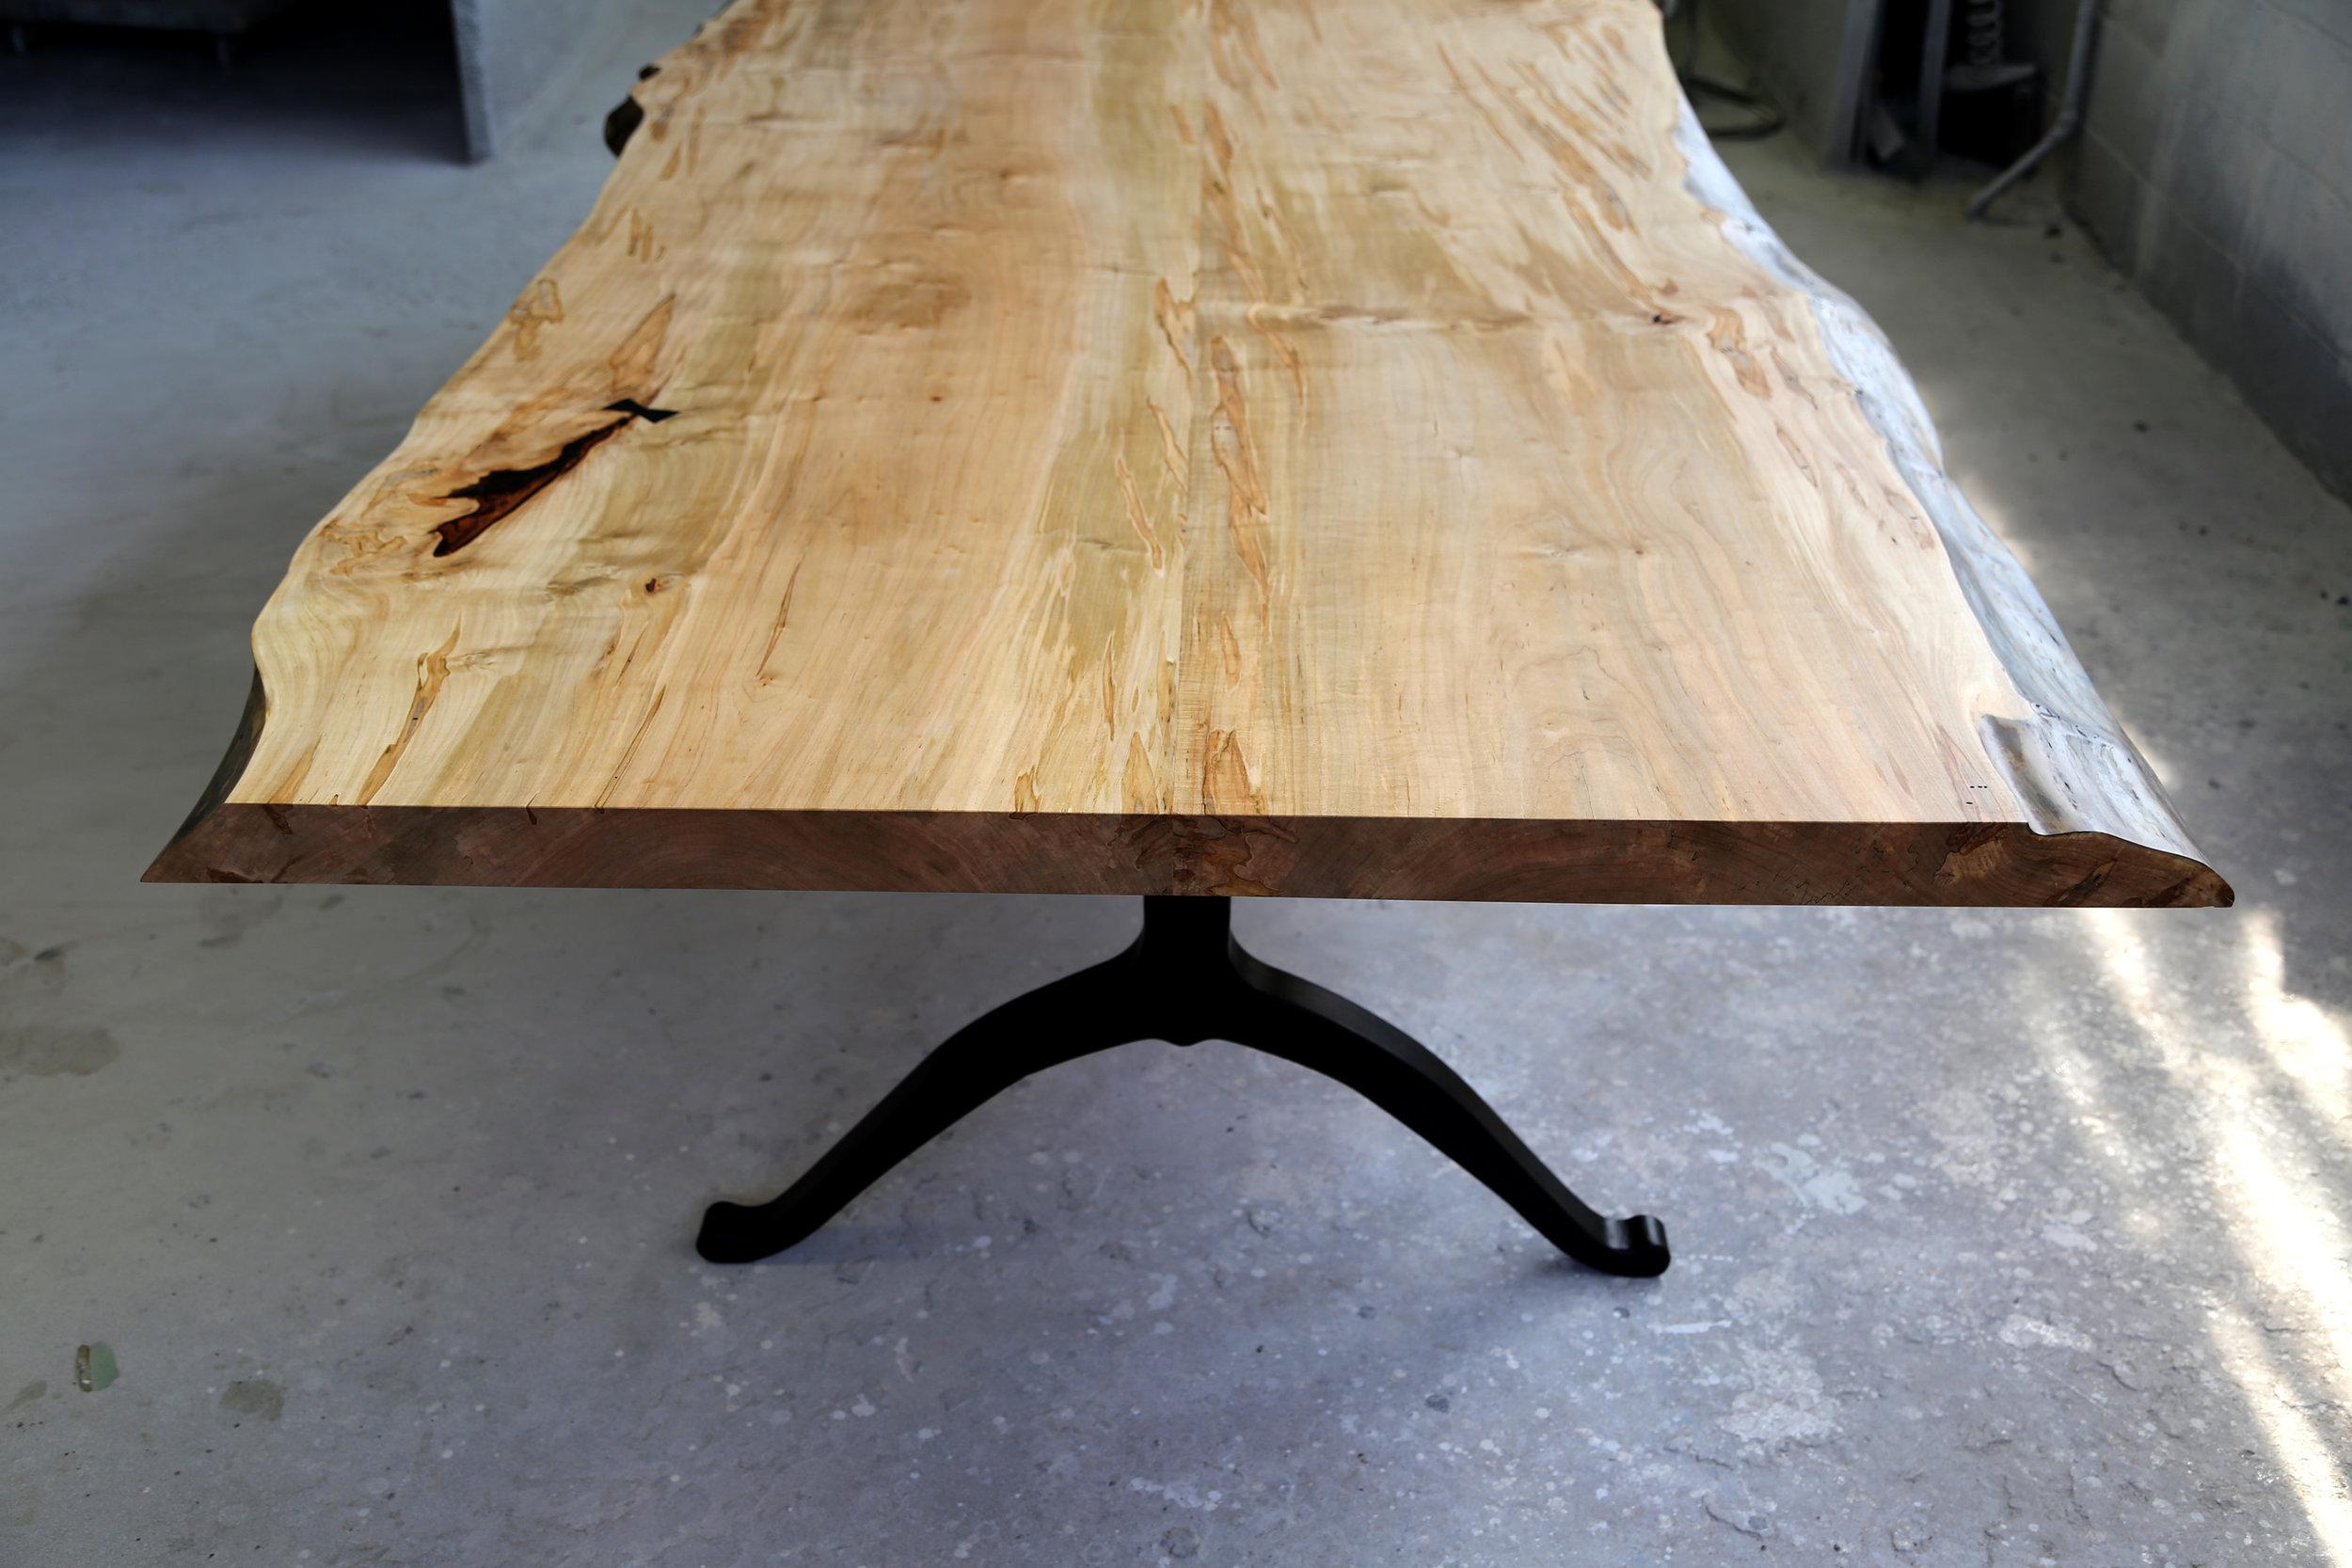 SENTIENT Ambrosia Maple Live Edge Table with Blackened Steel Wishbone Legs